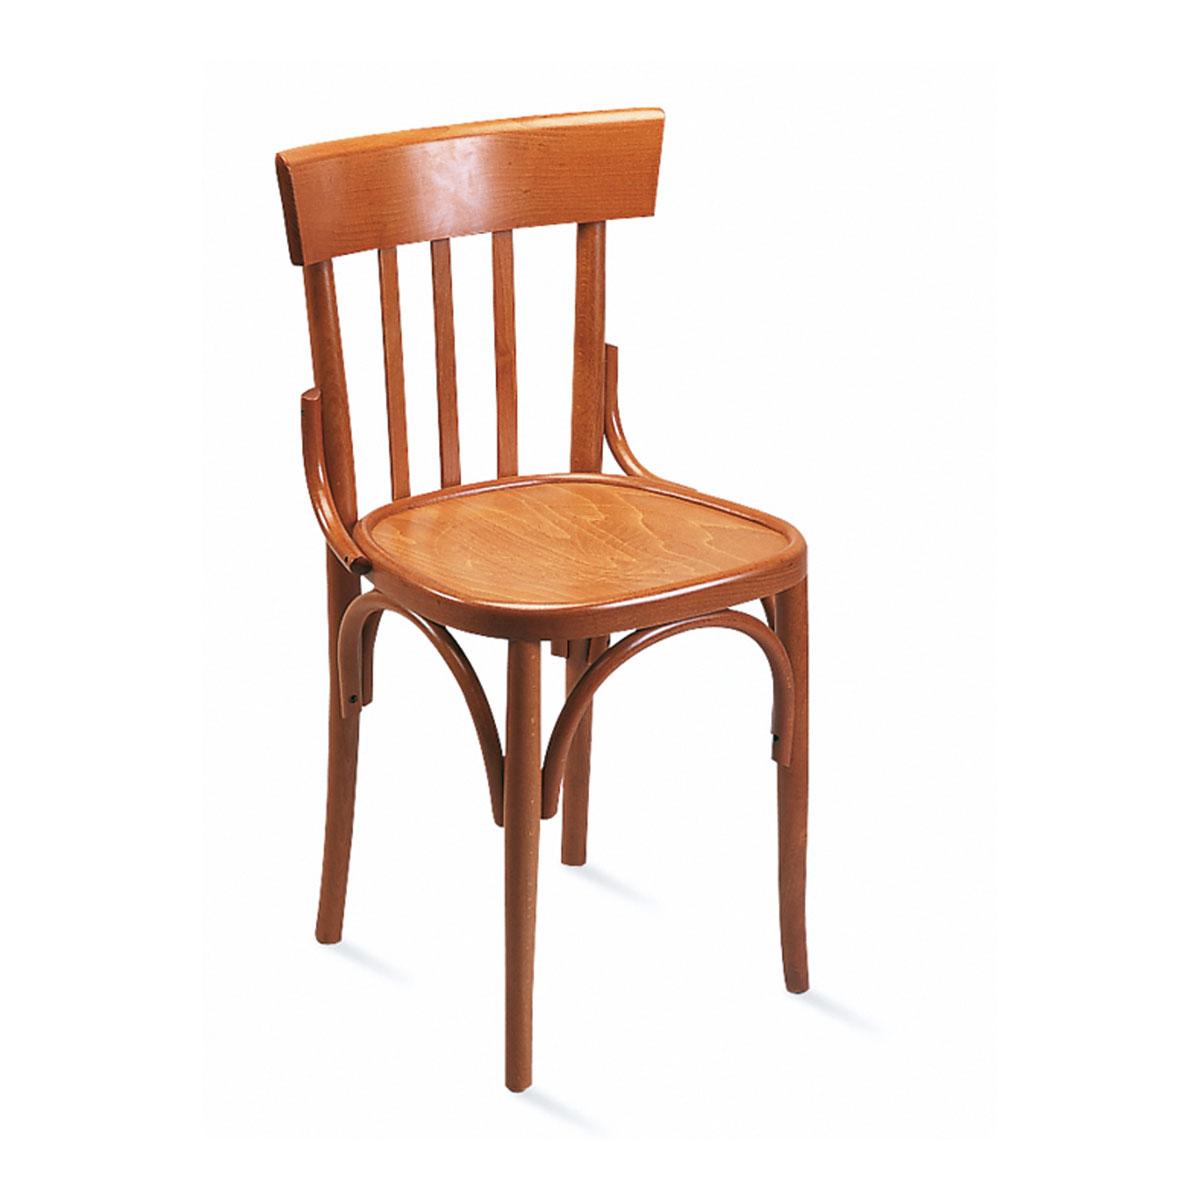 chaise bistrot bois fonction meuble. Black Bedroom Furniture Sets. Home Design Ideas